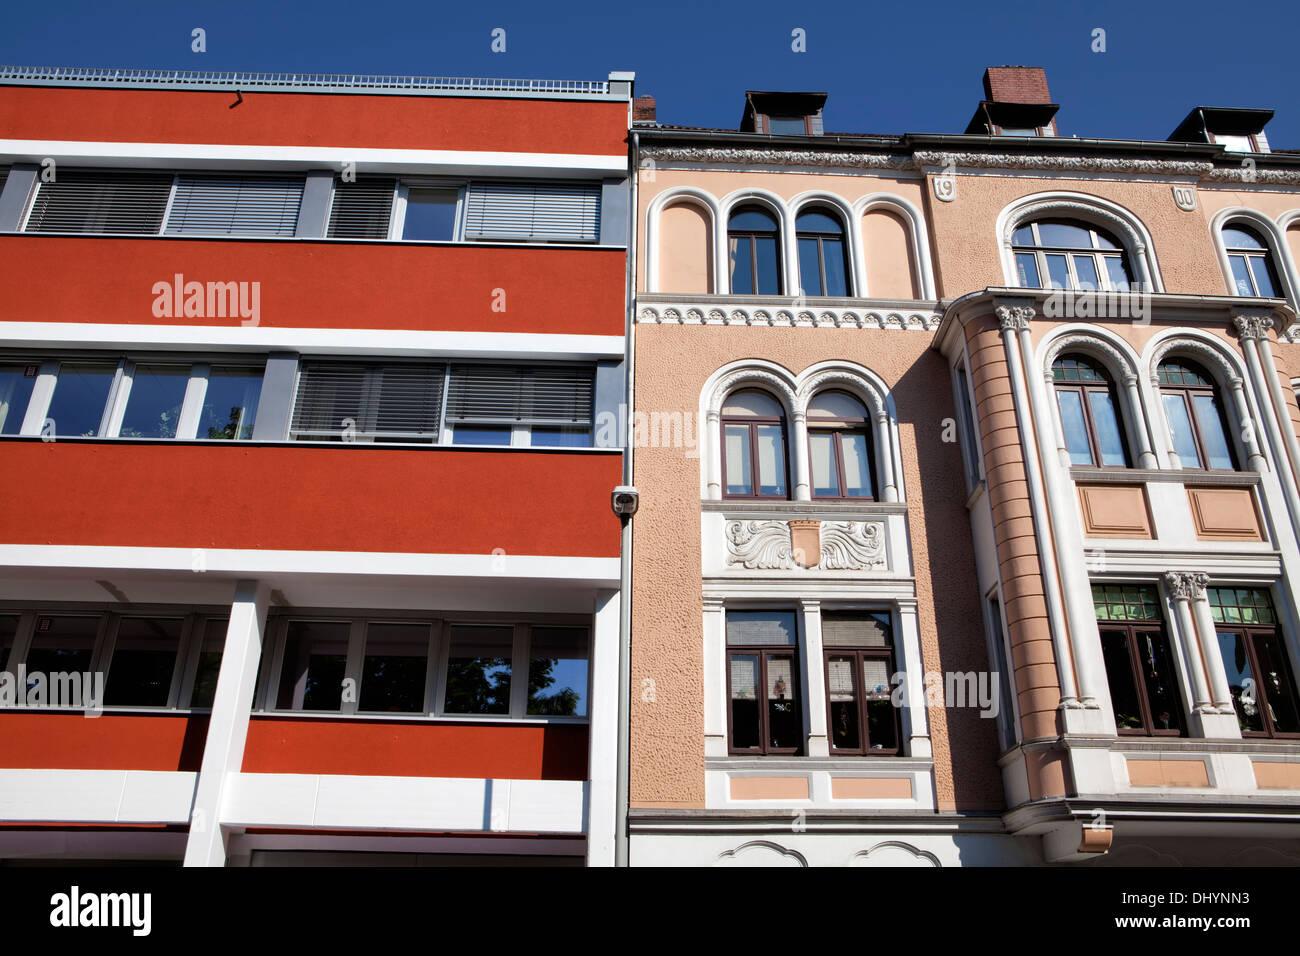 La arquitectura histórica, Linden, Hannover, Baja Sajonia, Alemania, Europa Imagen De Stock